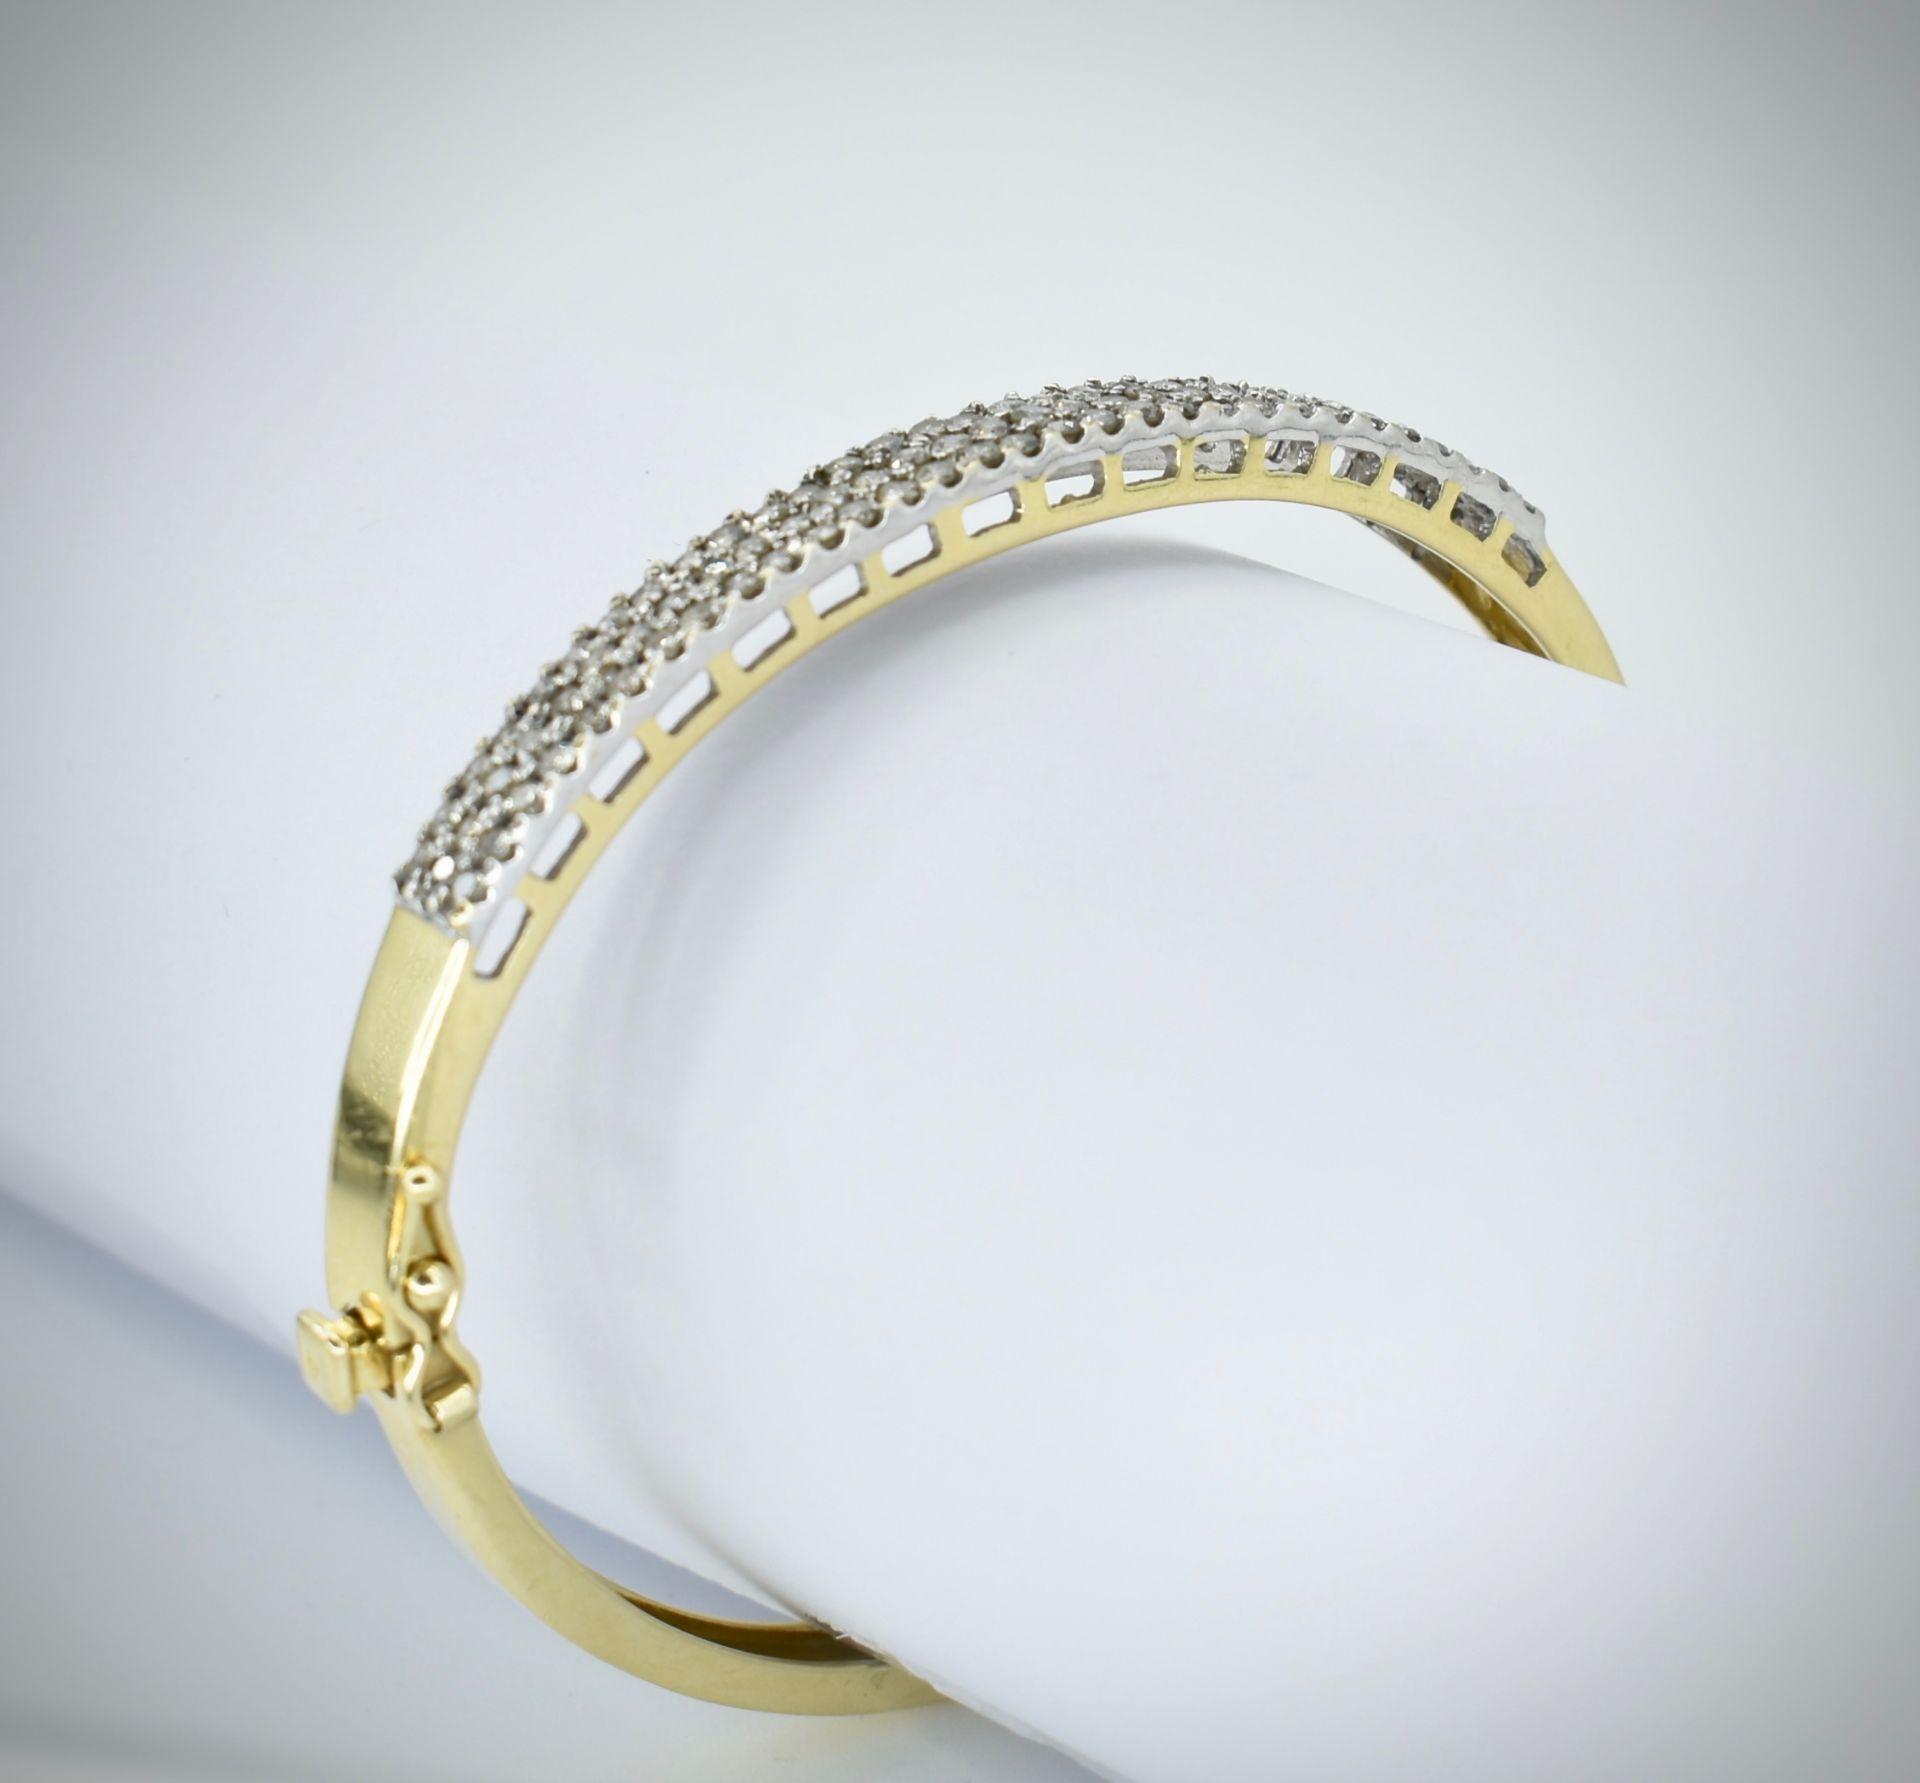 A 14ct Gold & Diamond Pave Fronted Bracelet - Bangle